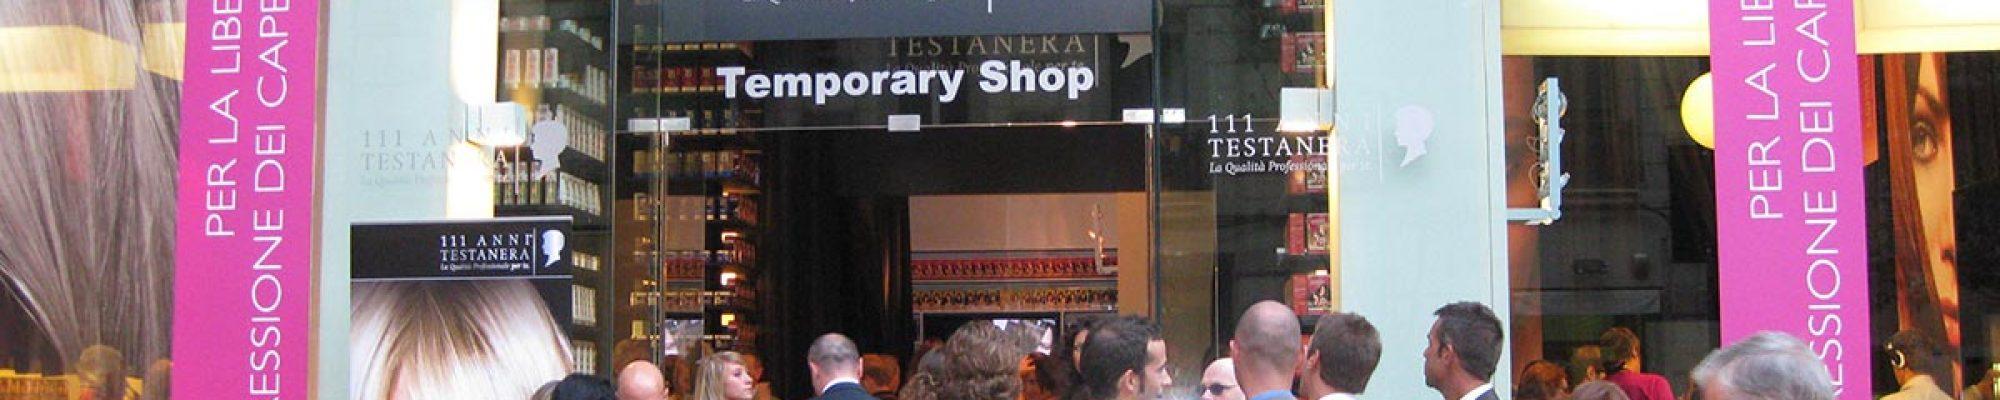 temporary-store-shop-milano-corso-garibaldi-evento-testanera-pop-up-noleggio